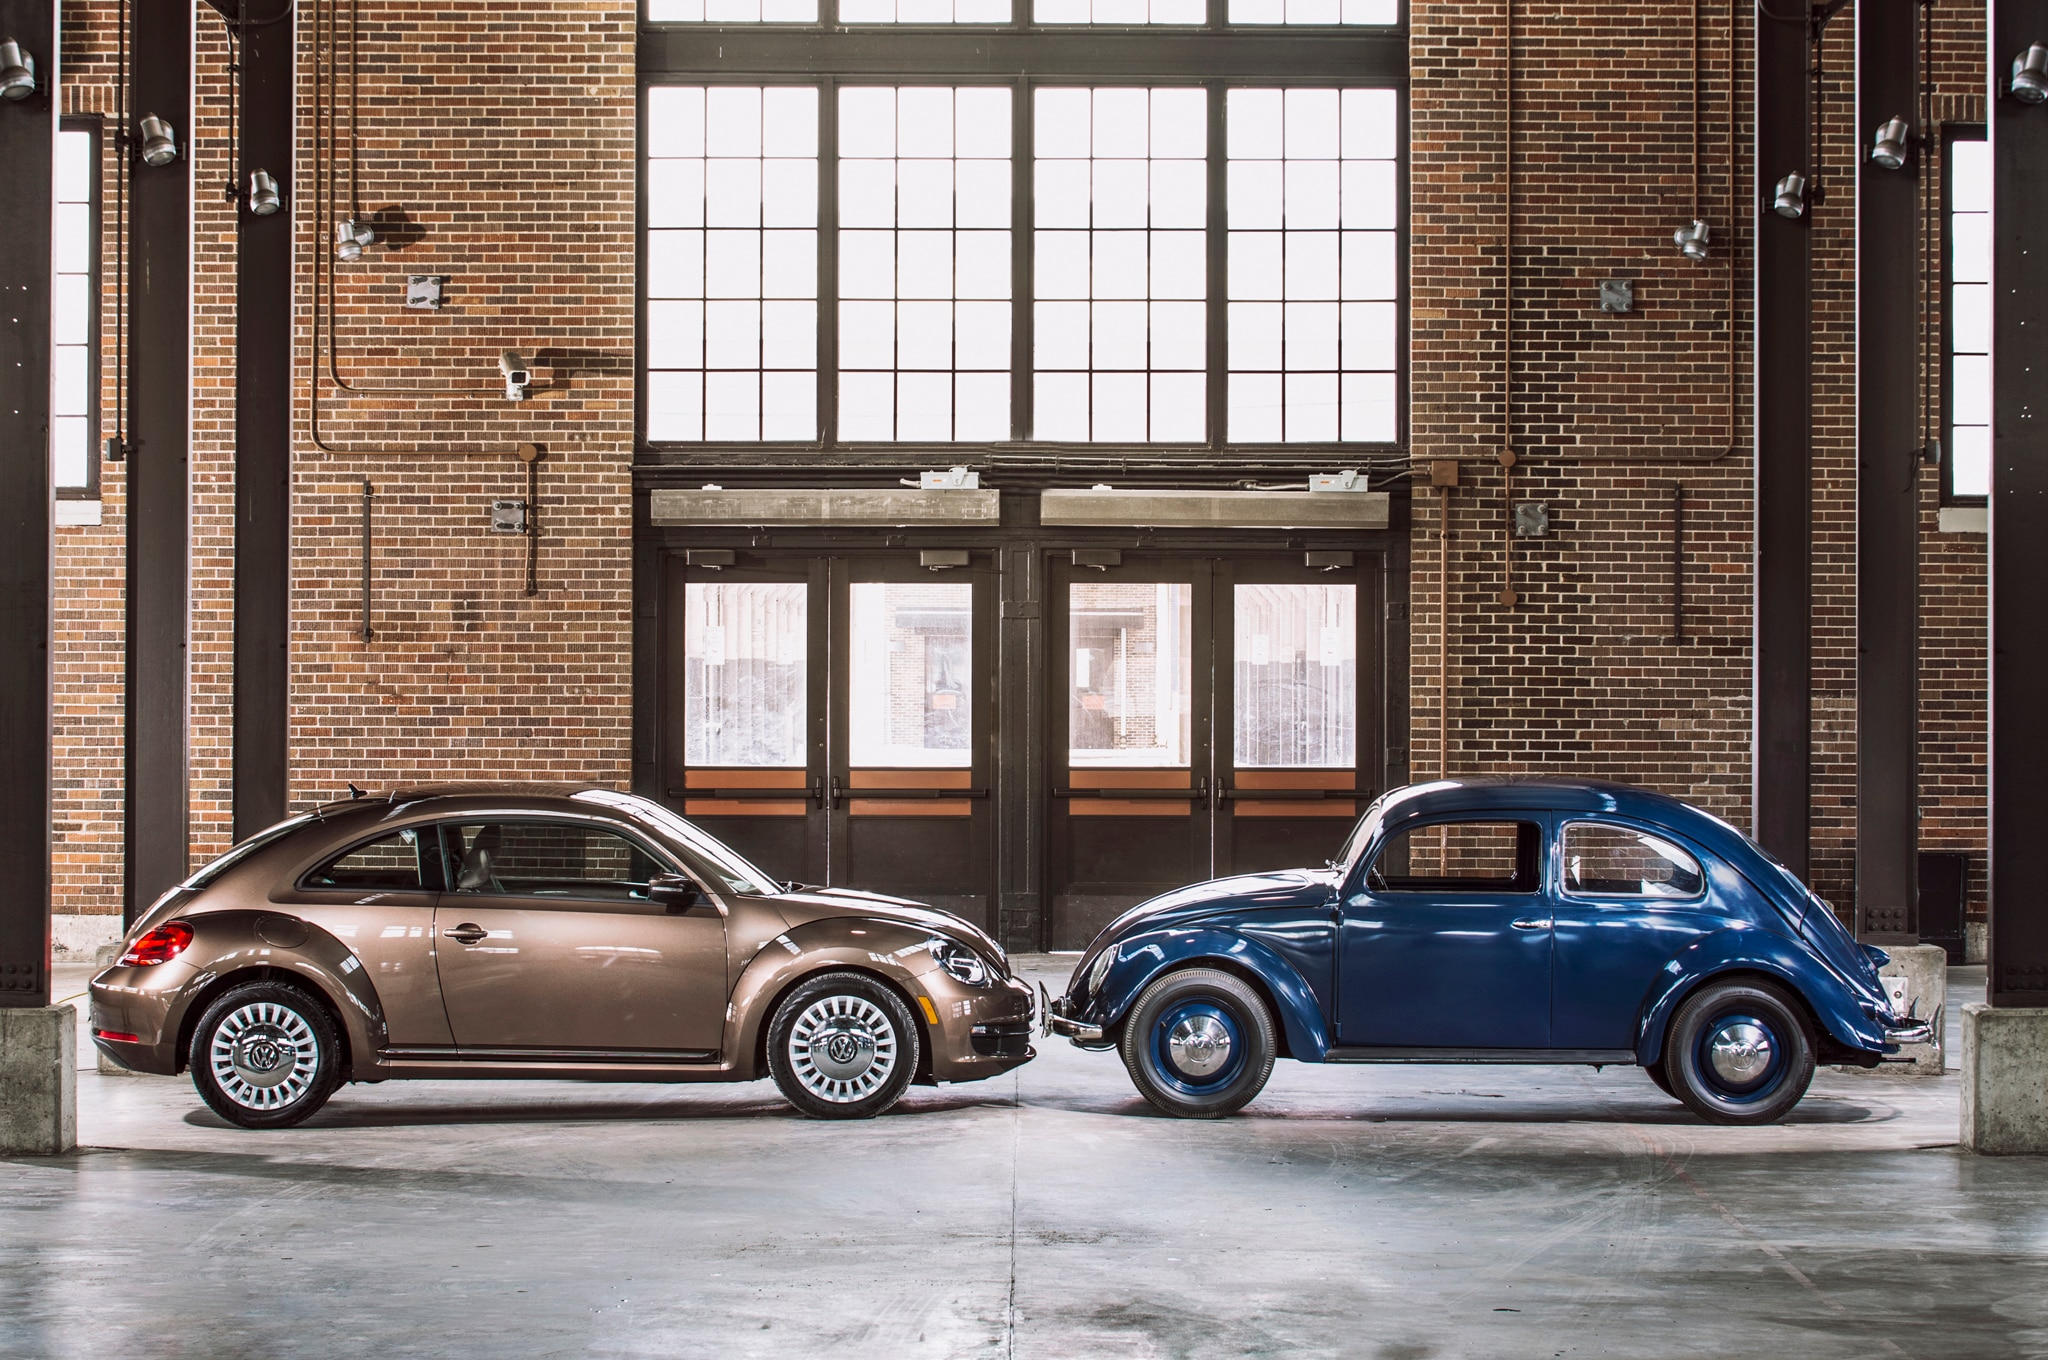 2014 Volkswagen Beetle Profile Classic Group1